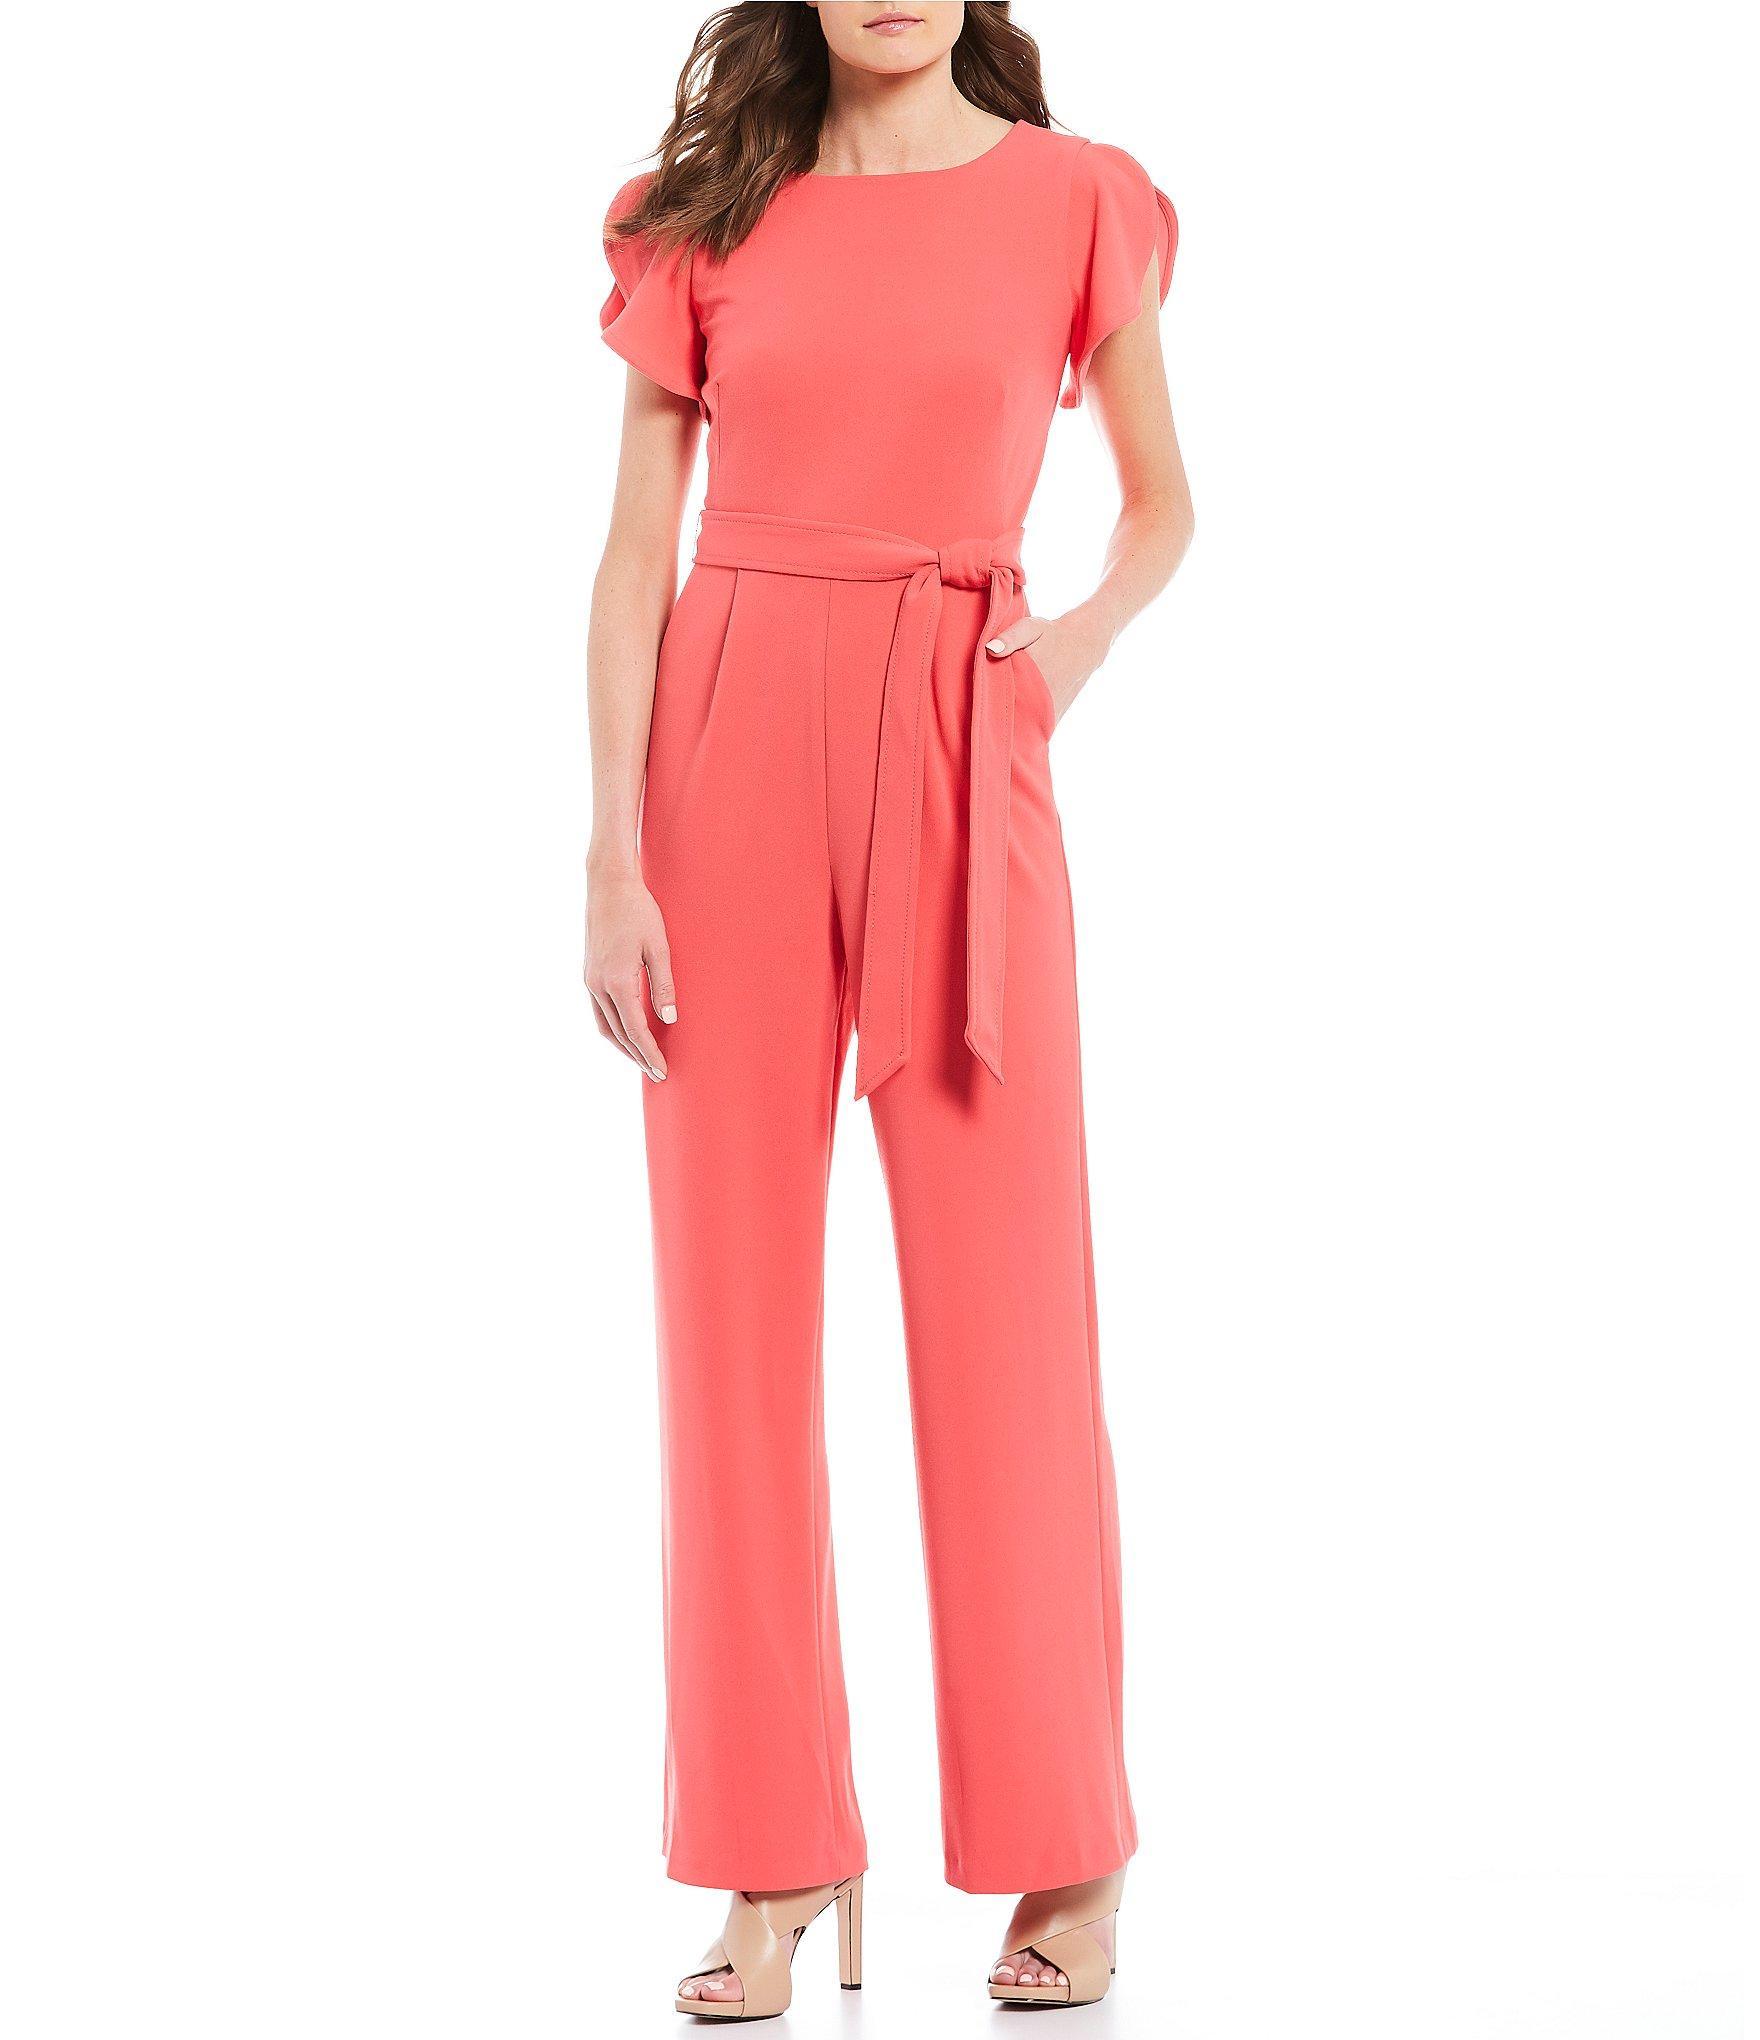 533e887cd66a Calvin Klein - Red Split Ruffle Sleeve Tie Waist Jumpsuit - Lyst. View  fullscreen